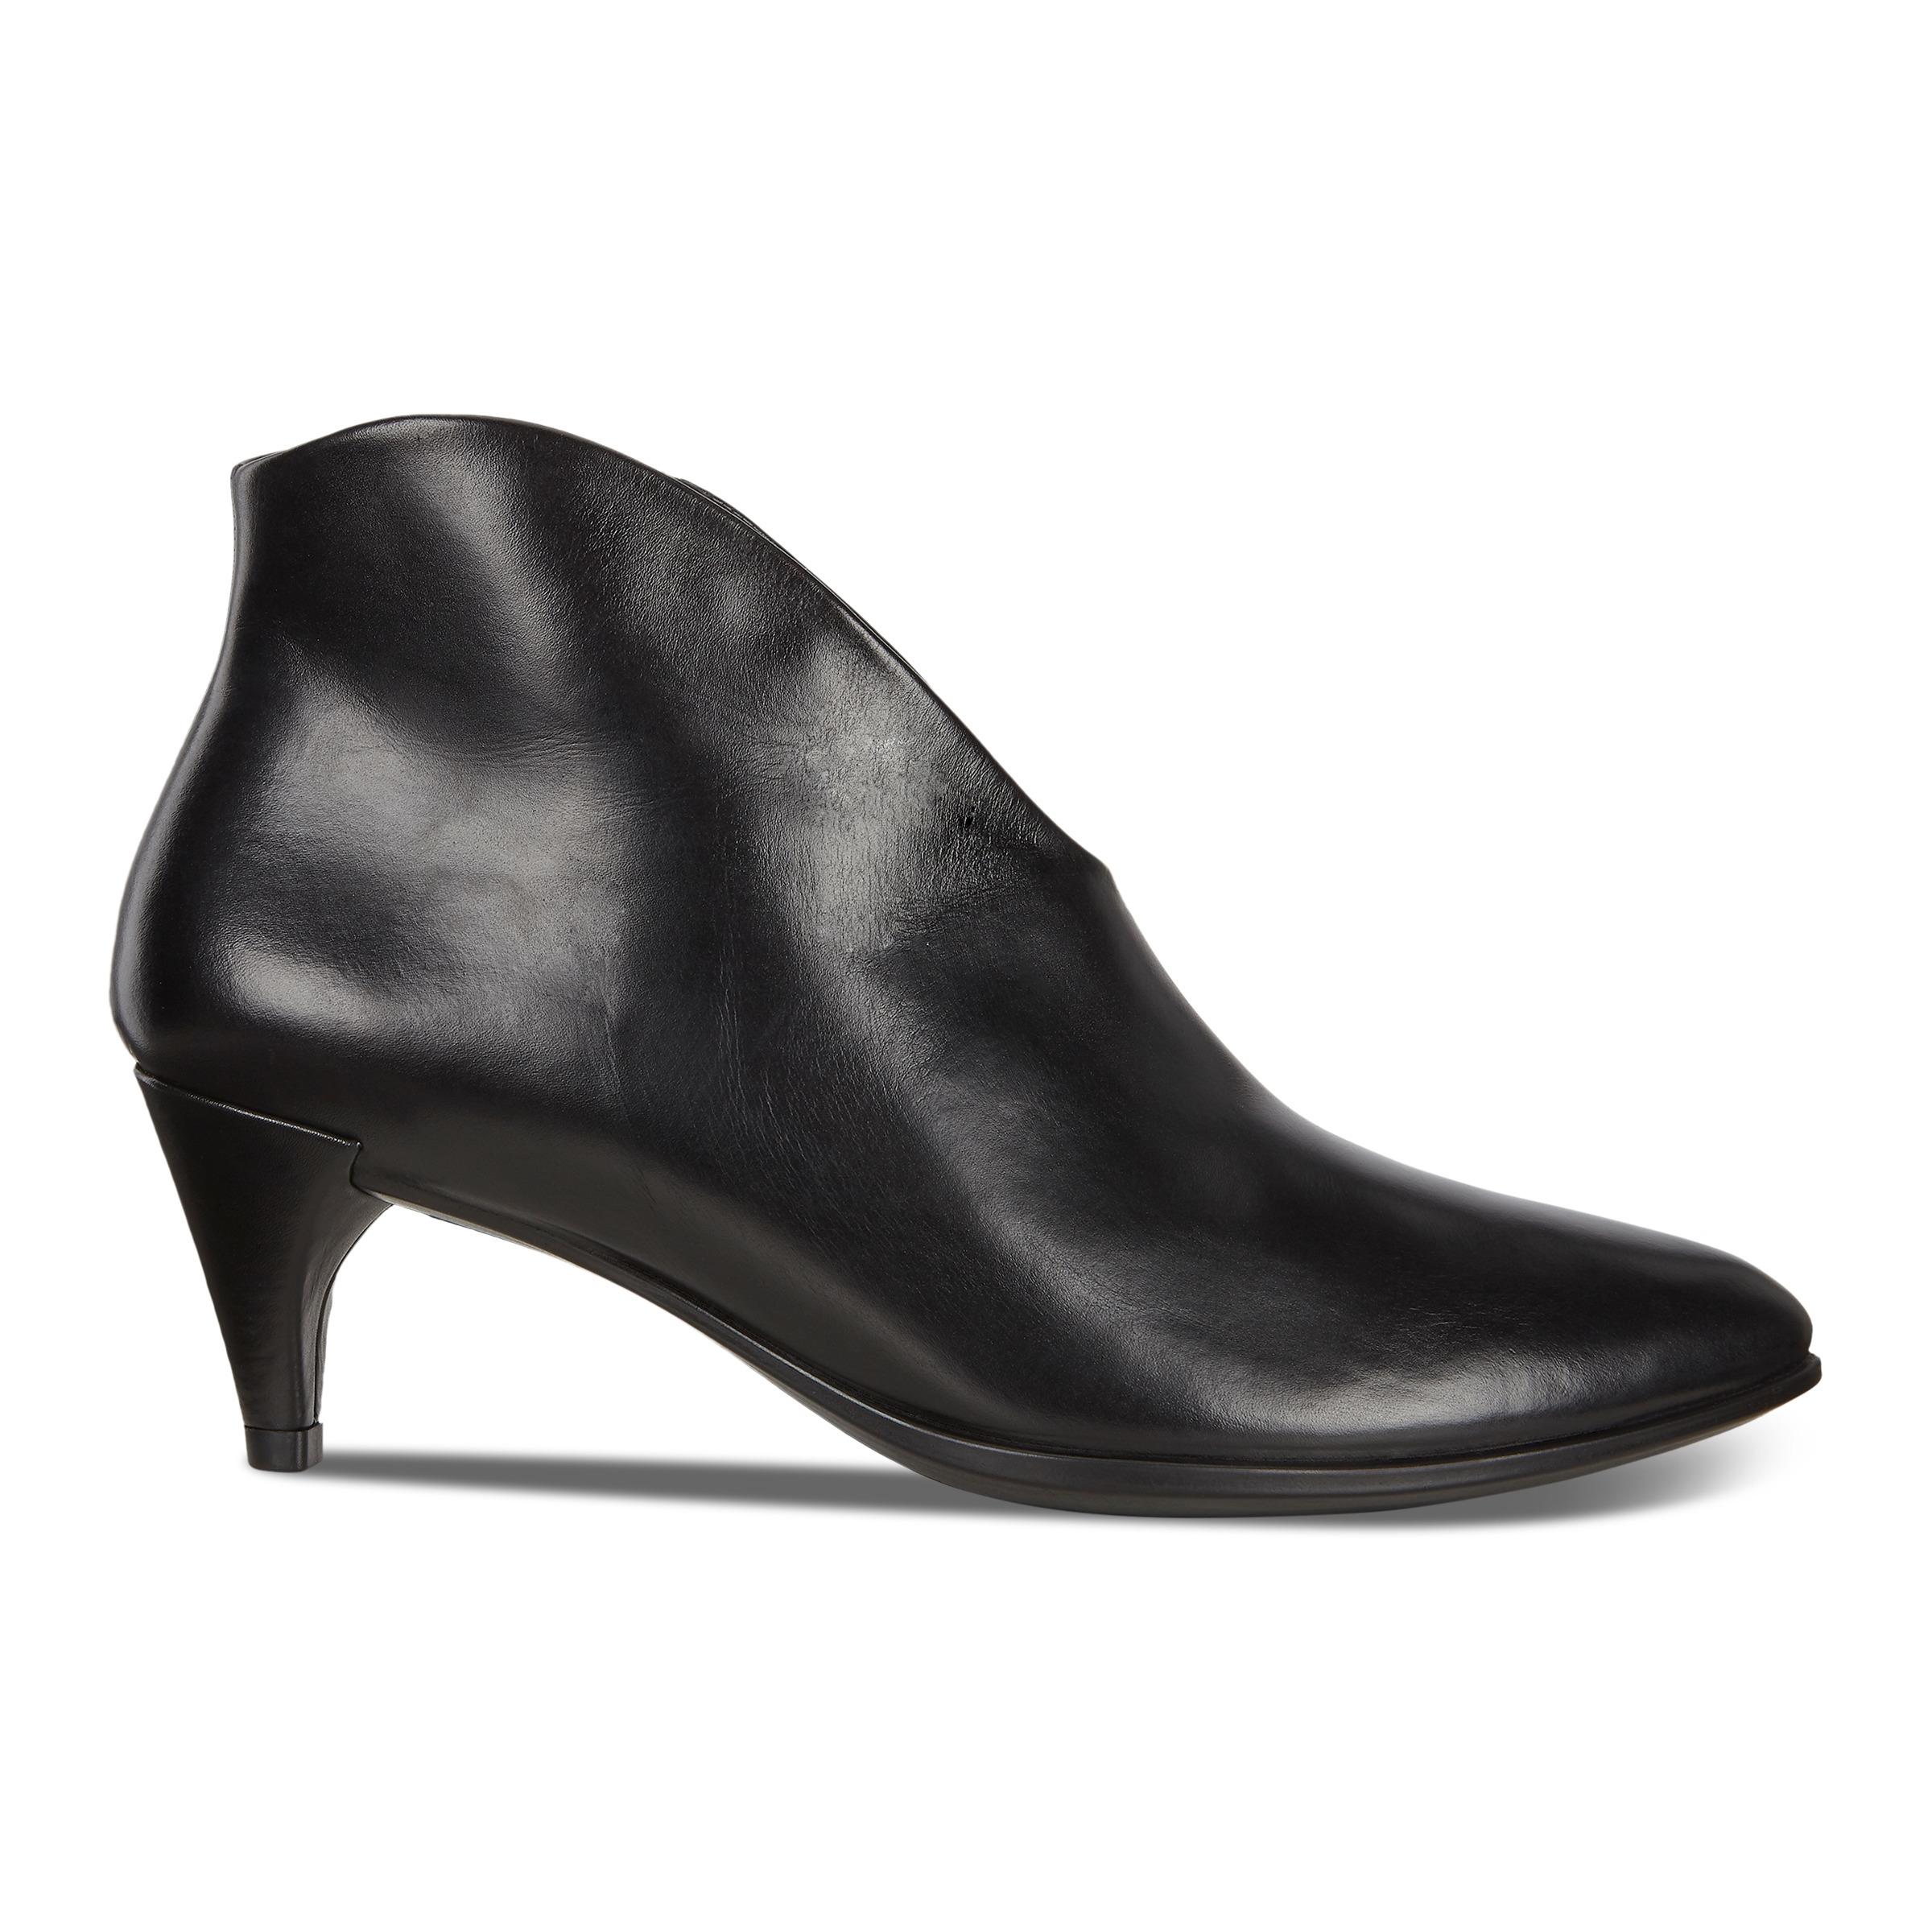 ecco mode sko, Ecco Shape 75 Sleek Kernelæder Sort Støvler